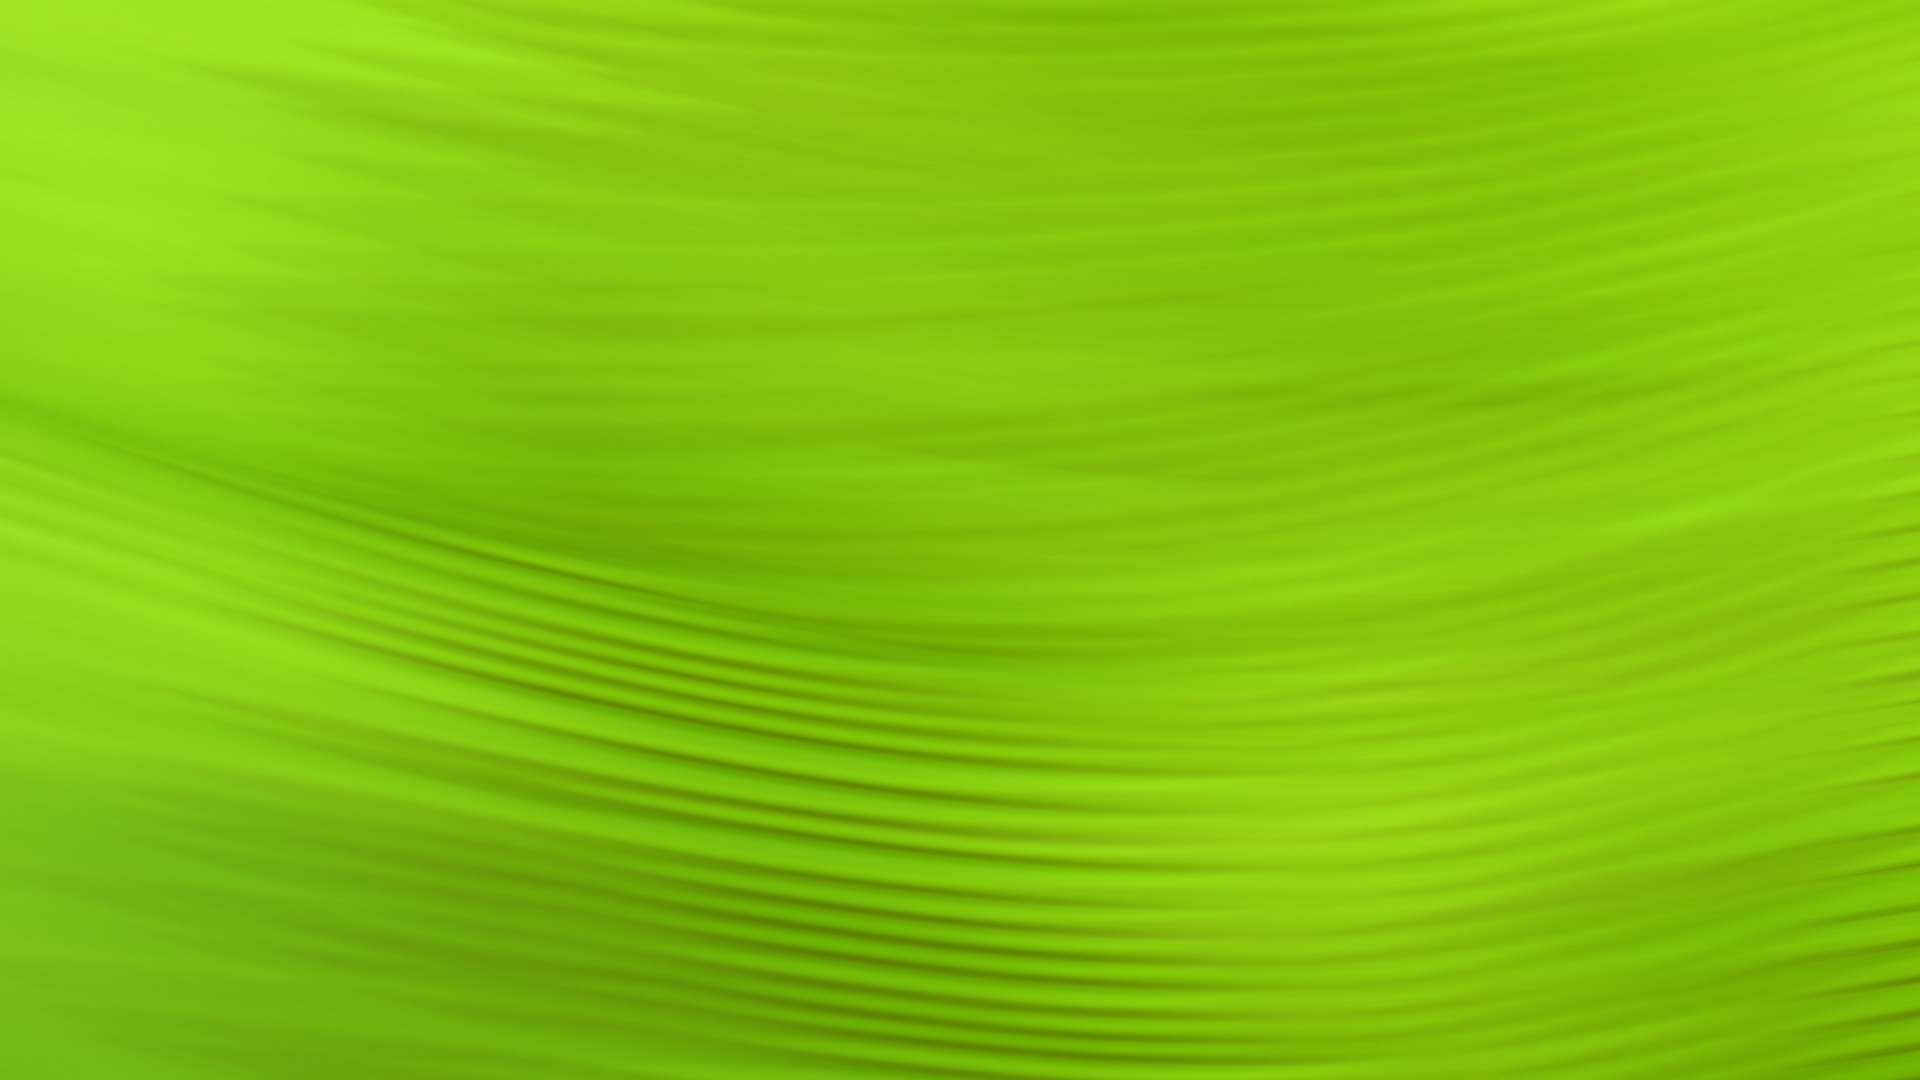 green free abstract wallpaper desktop background wallpaper